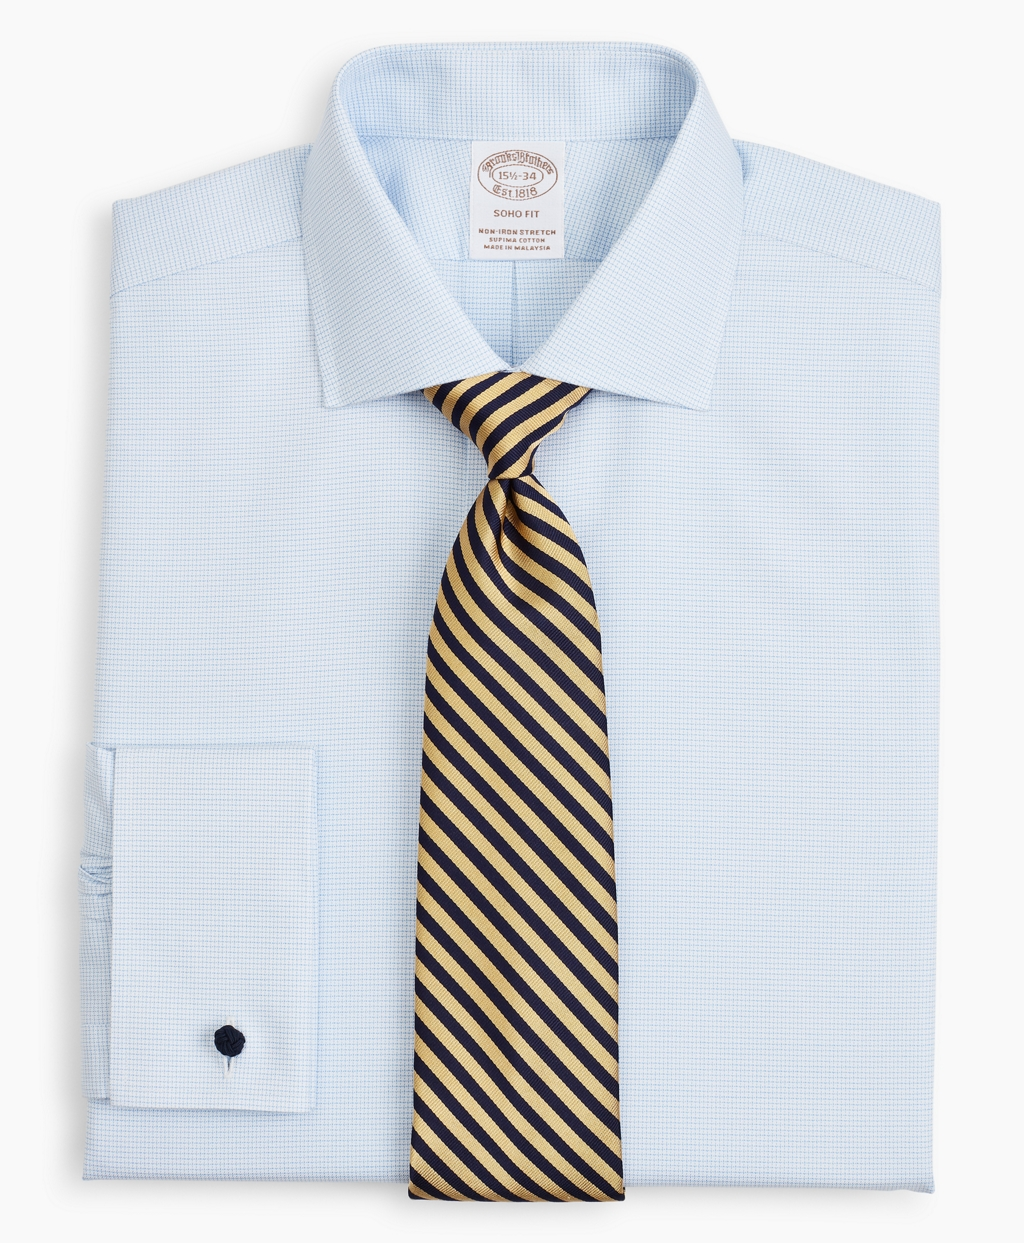 Brooksbrothers Stretch Soho Extra-Slim-Fit Dress Shirt, Non-Iron Twill English Collar French Cuff Micro-Check